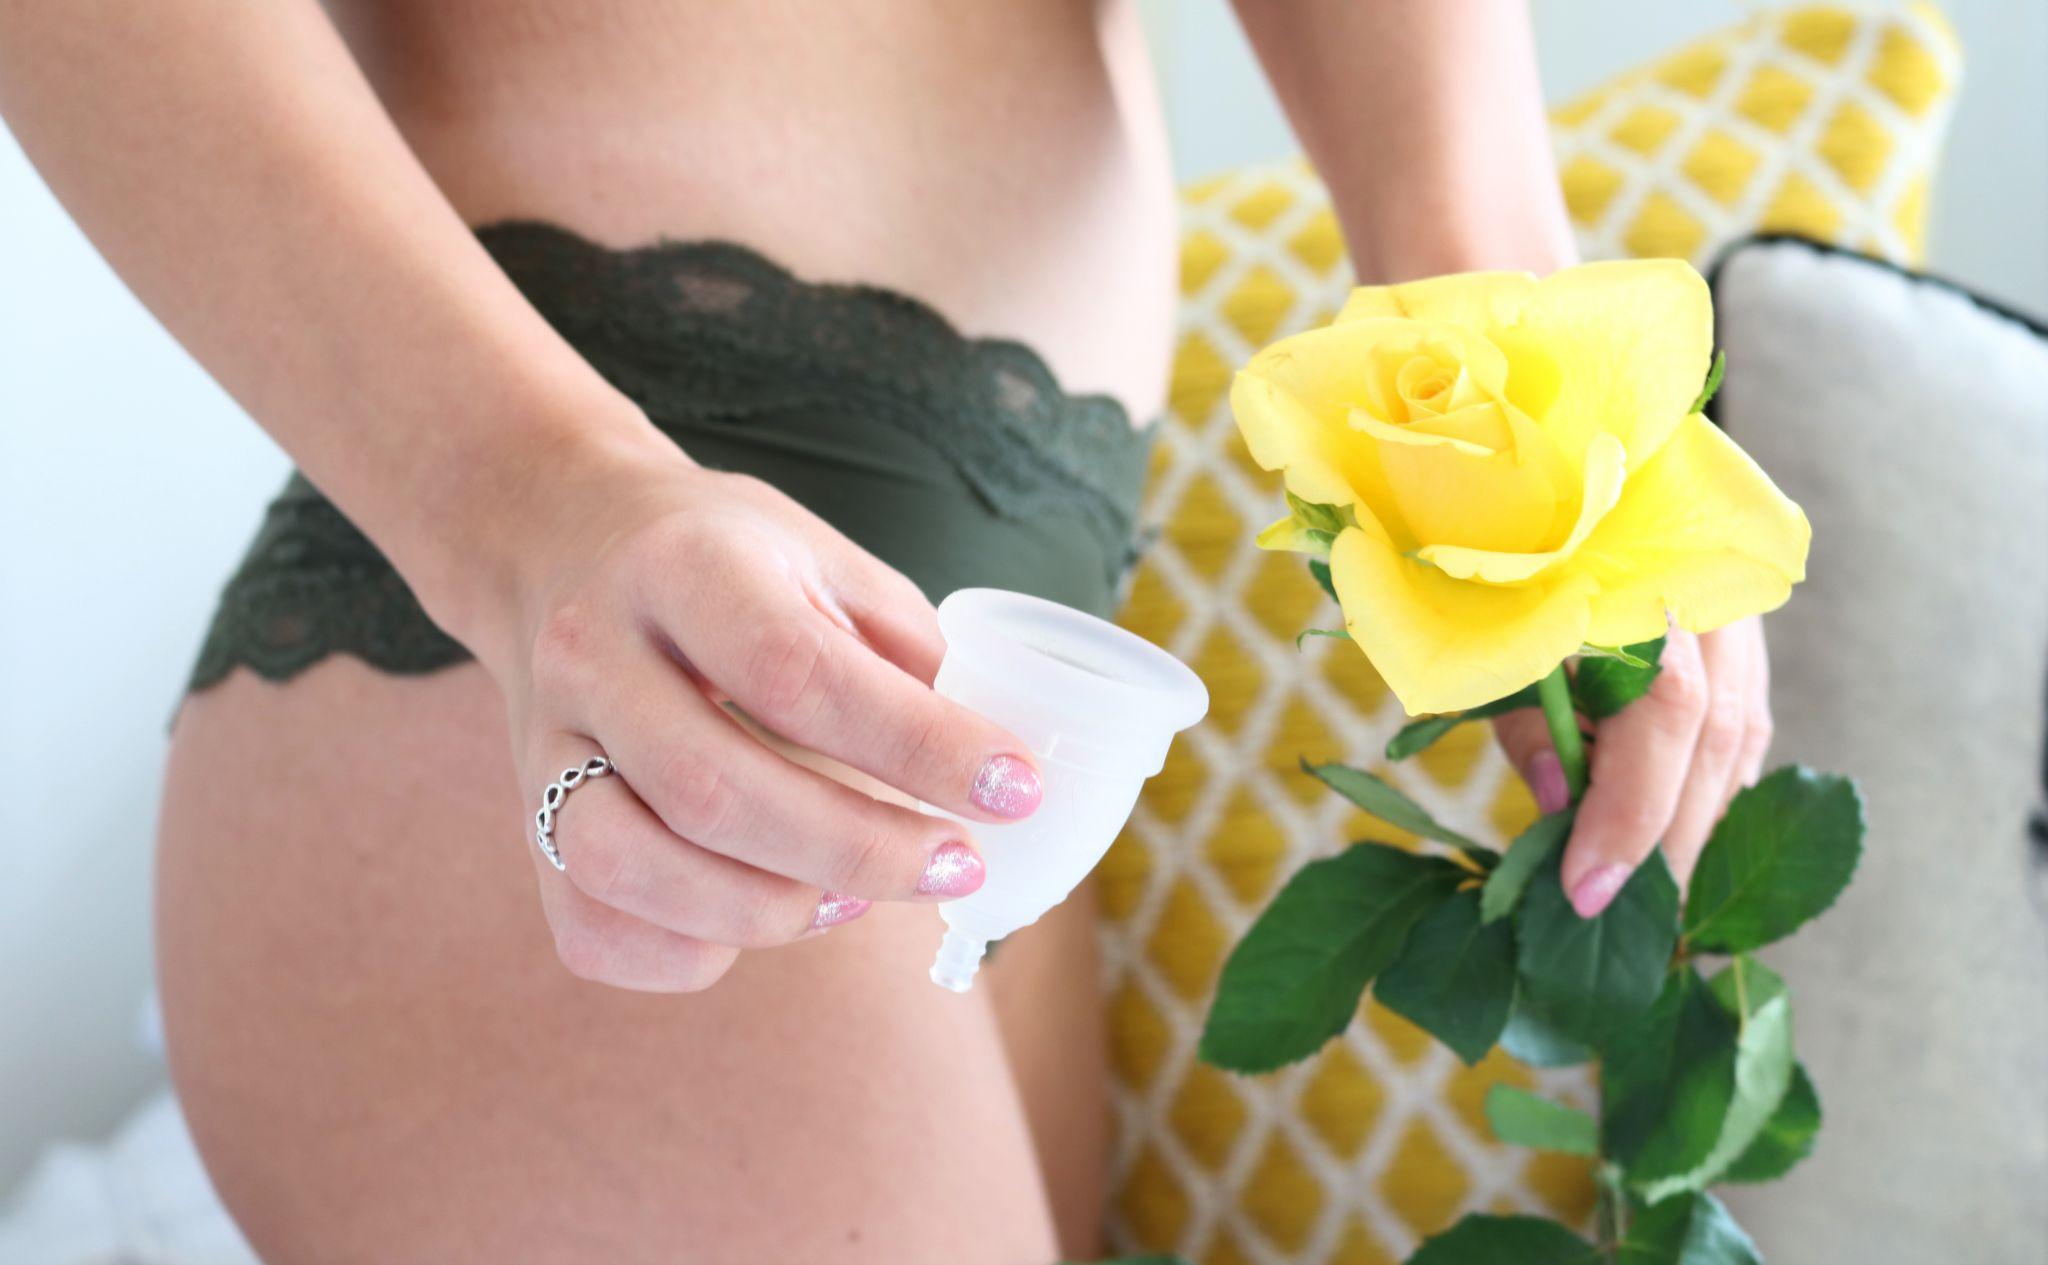 menstrual cup - Mooncup